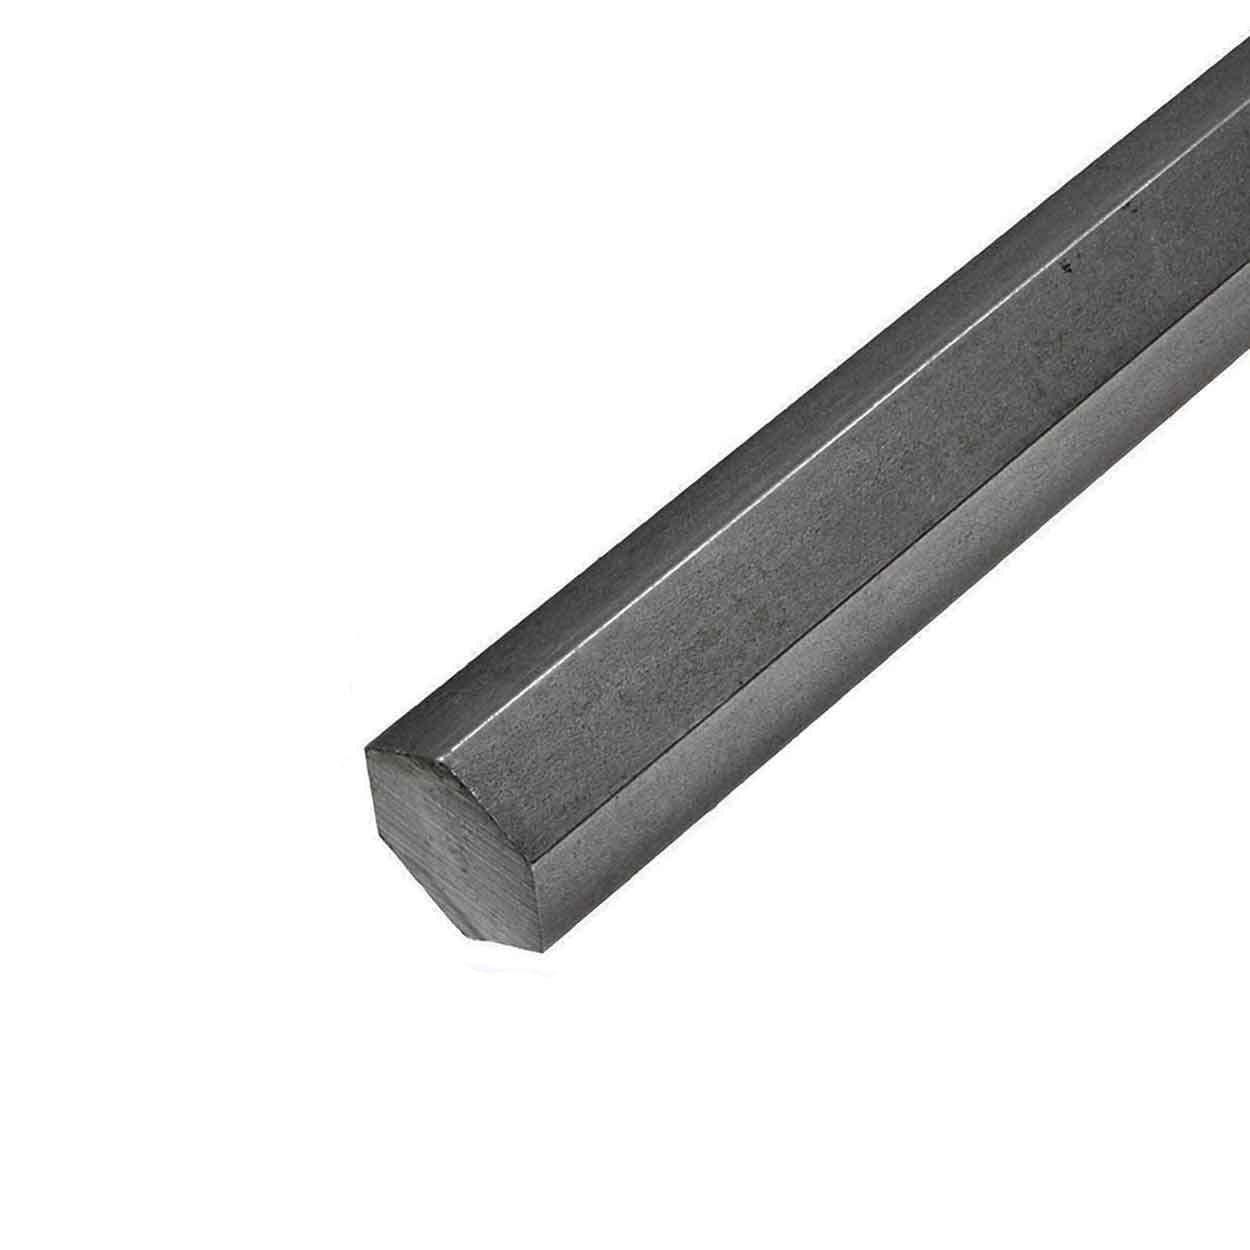 x 24 inches 0.875 Online Metal Supply 12L14 Steel Hexagon Bar 7//8 inch